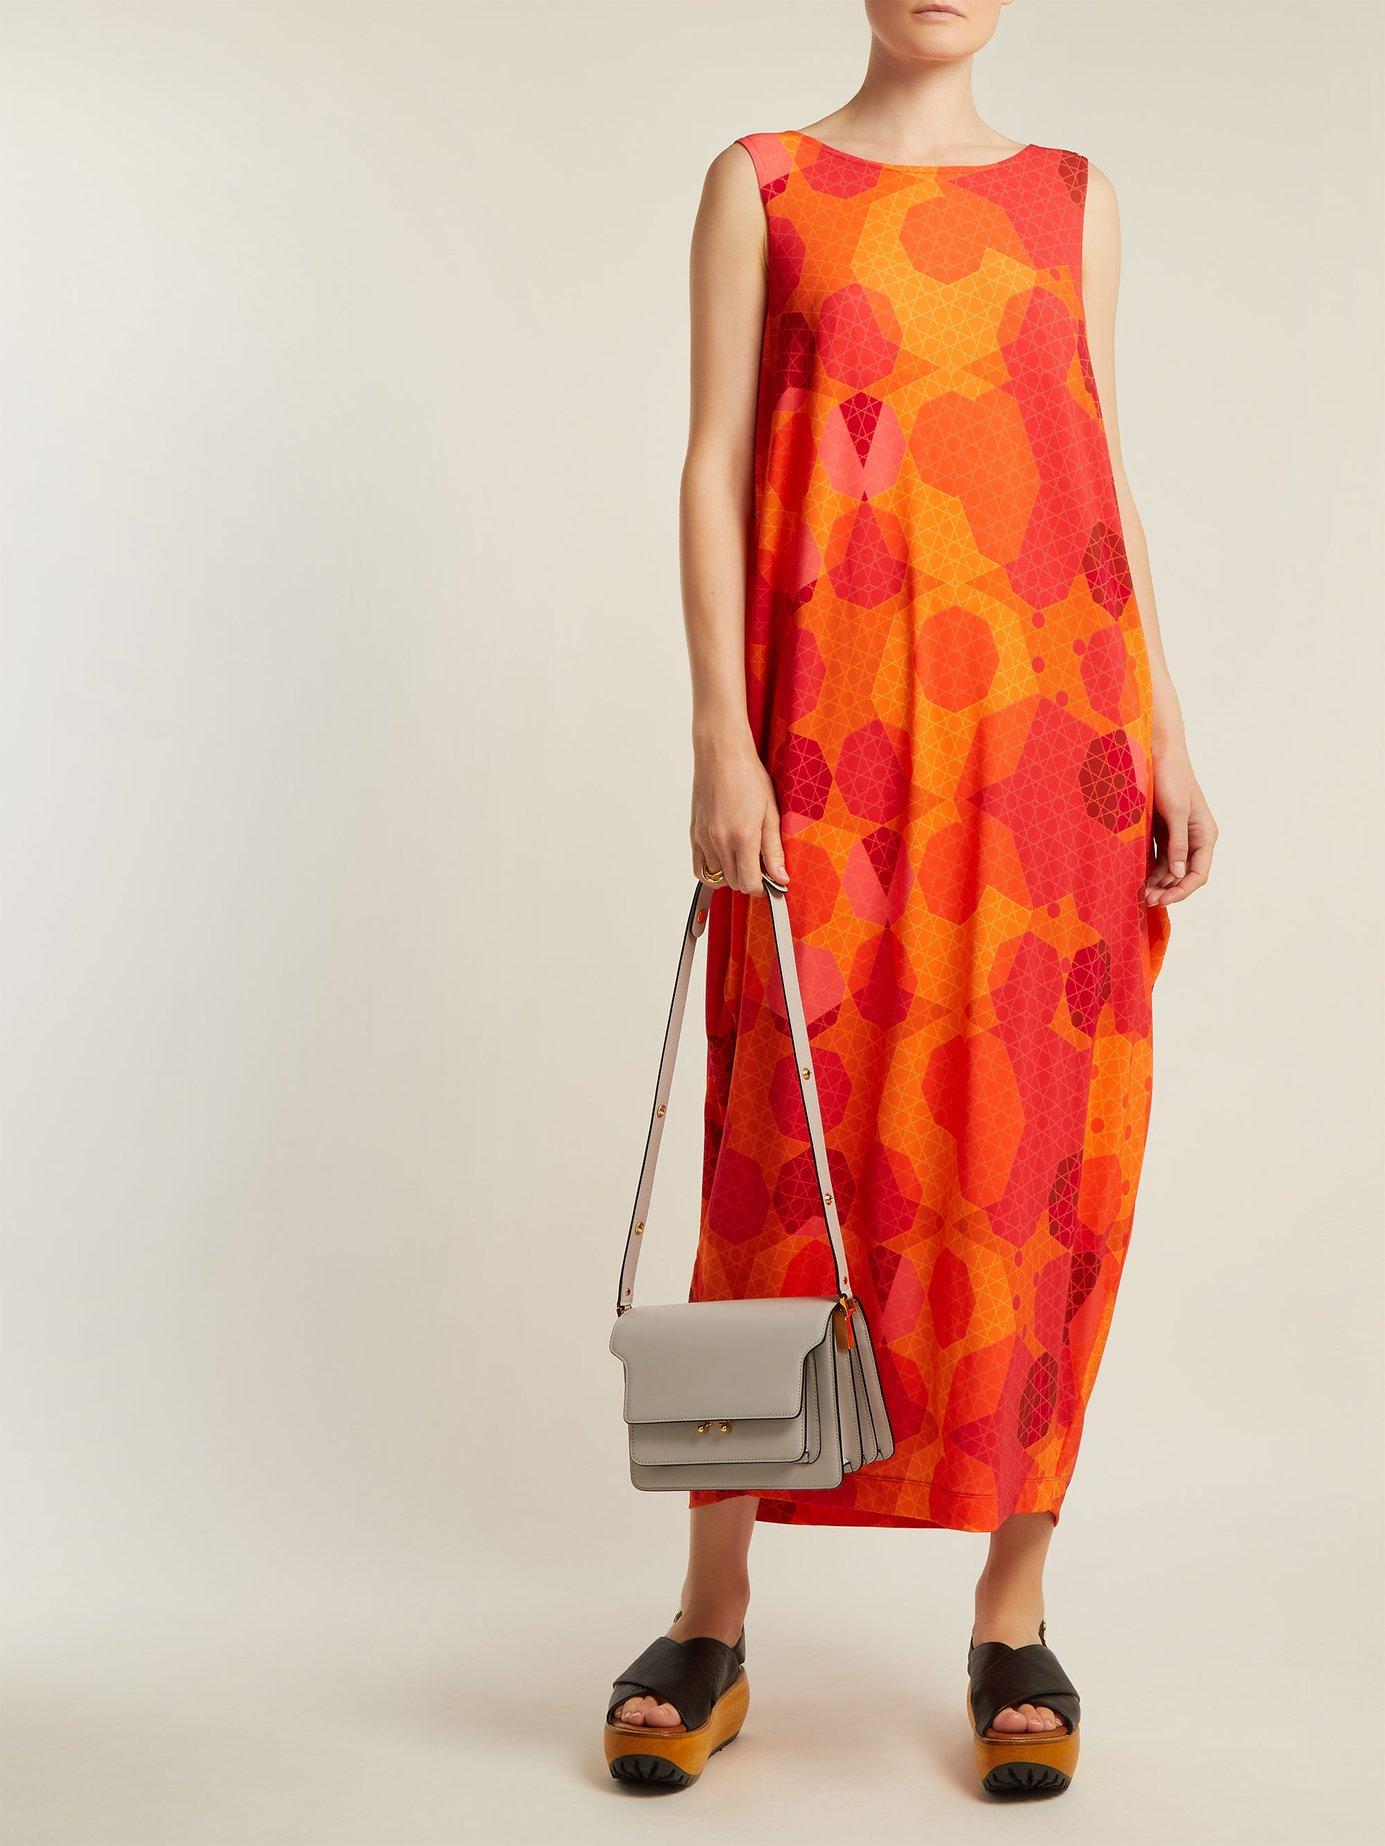 Sunlight geometric-print dress by Issey Miyake